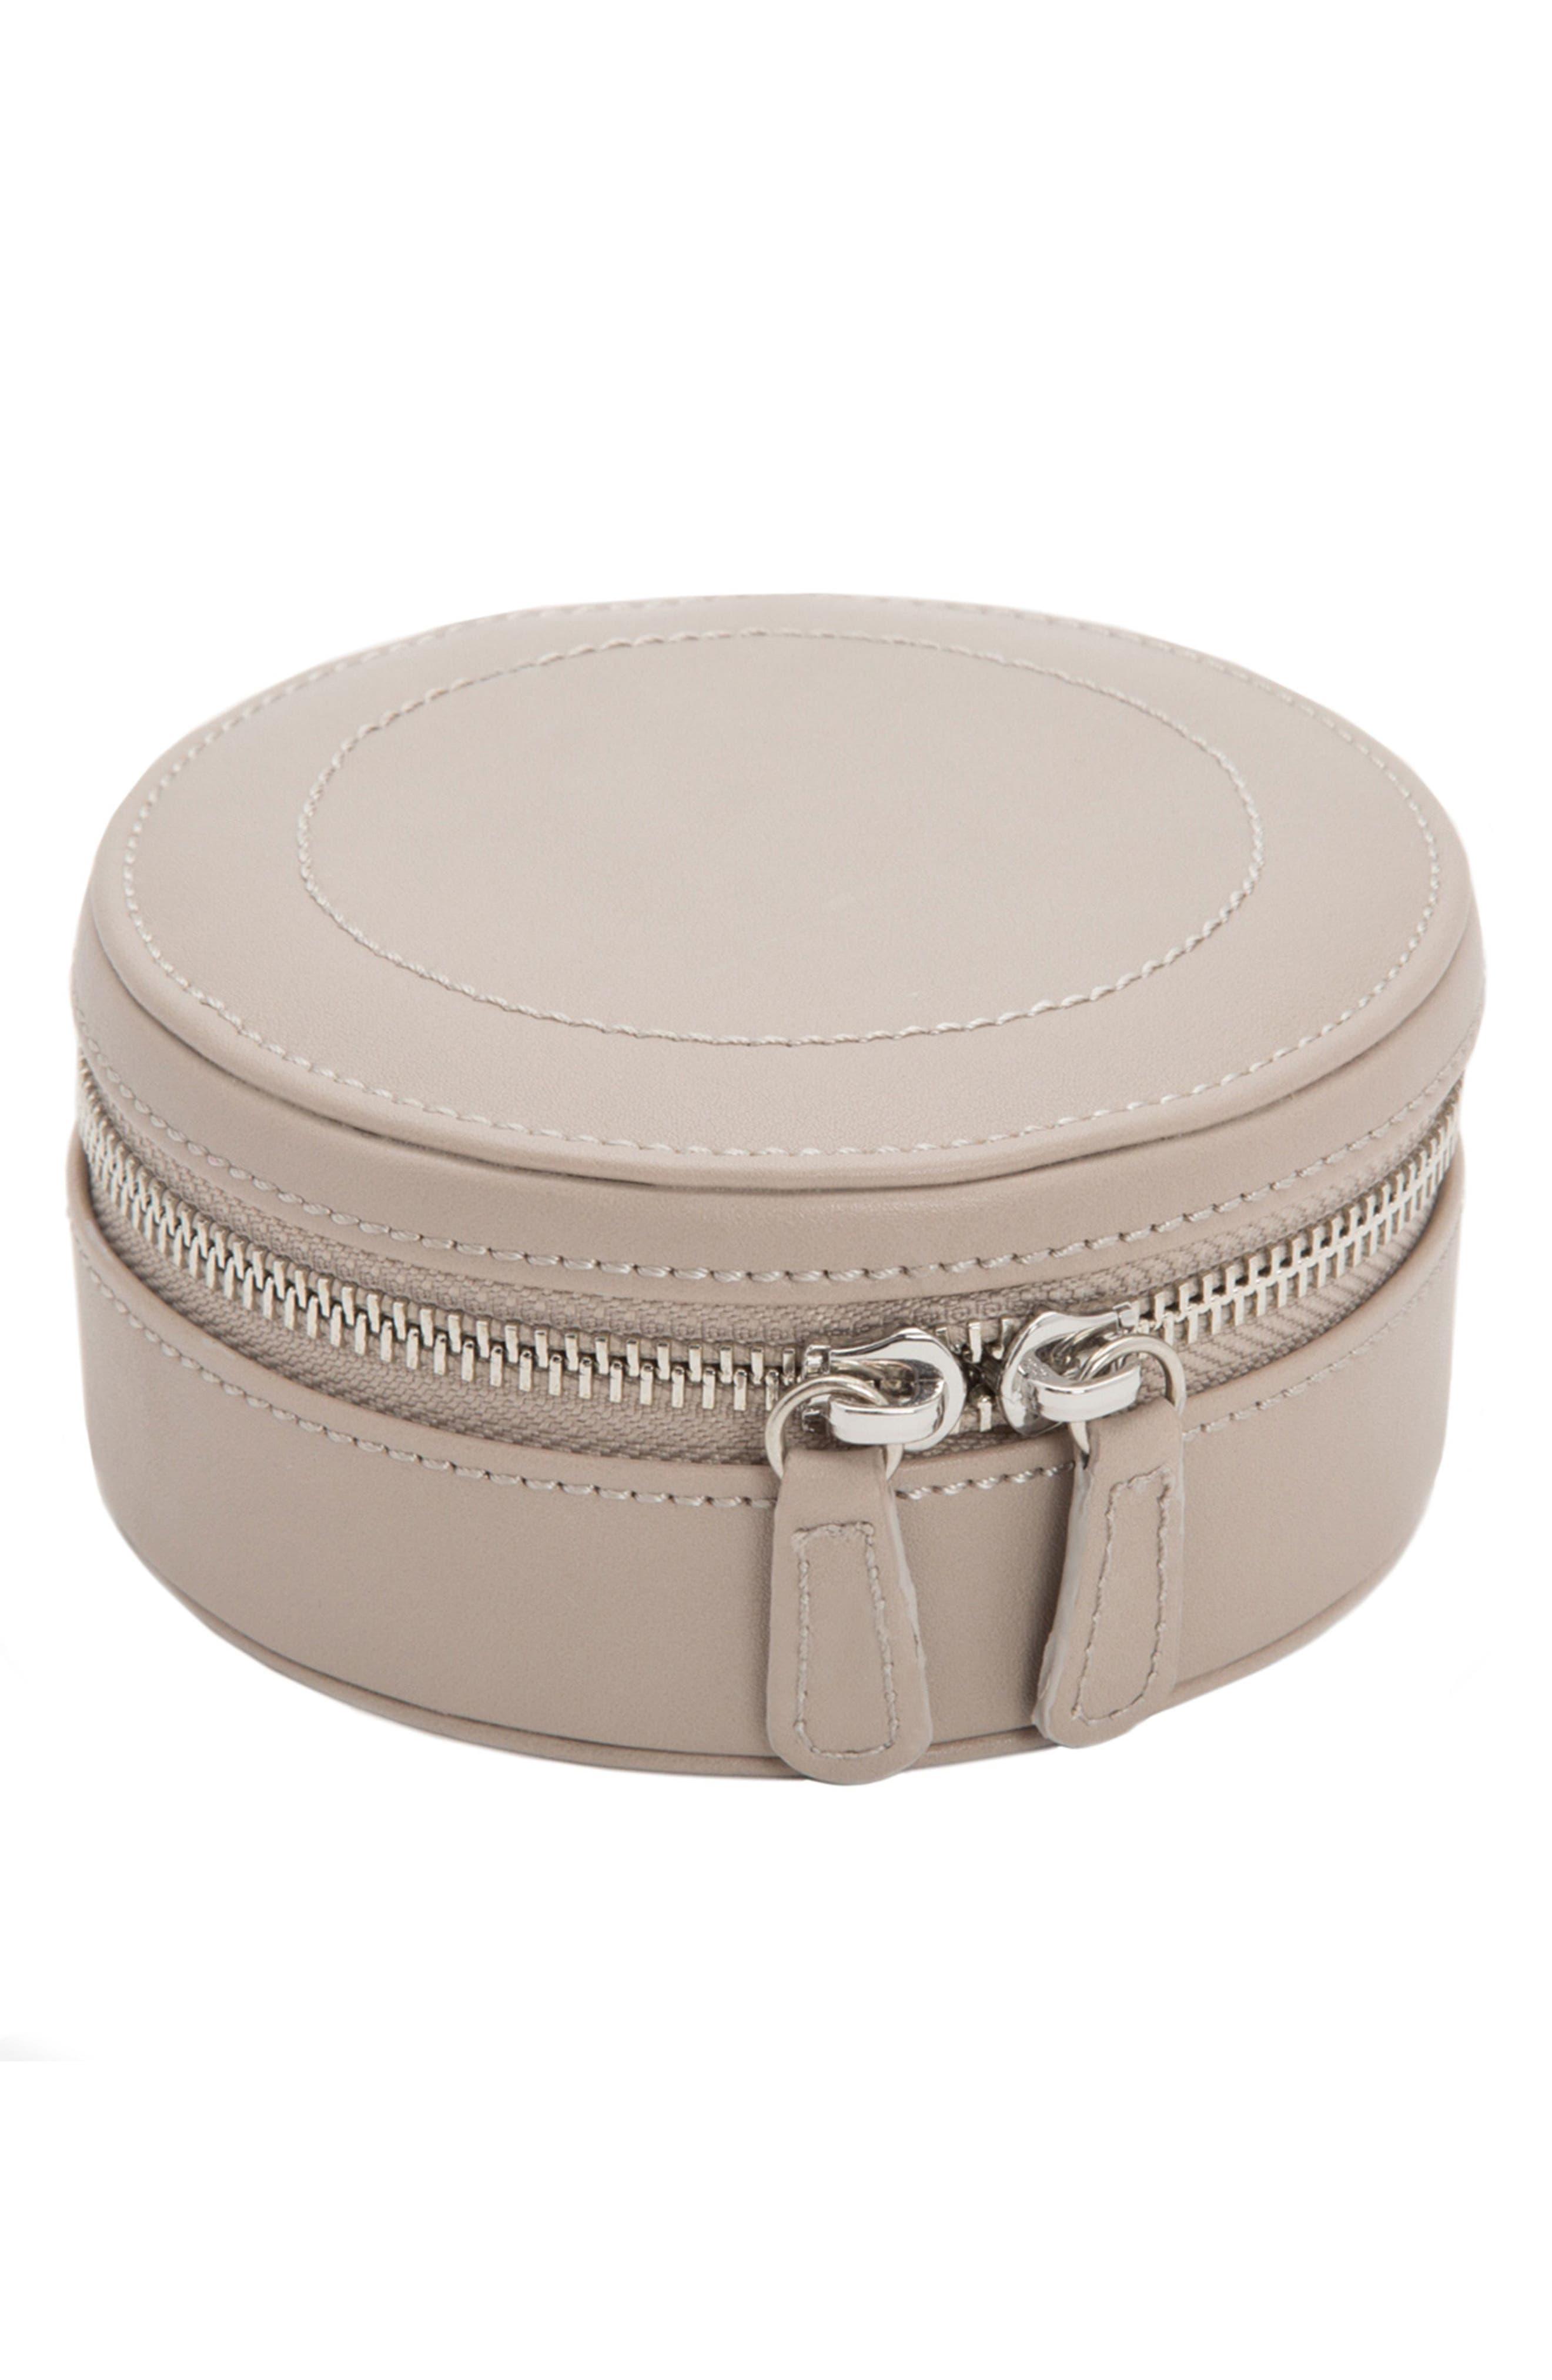 Sophia Round Zip Case,                         Main,                         color, MINK